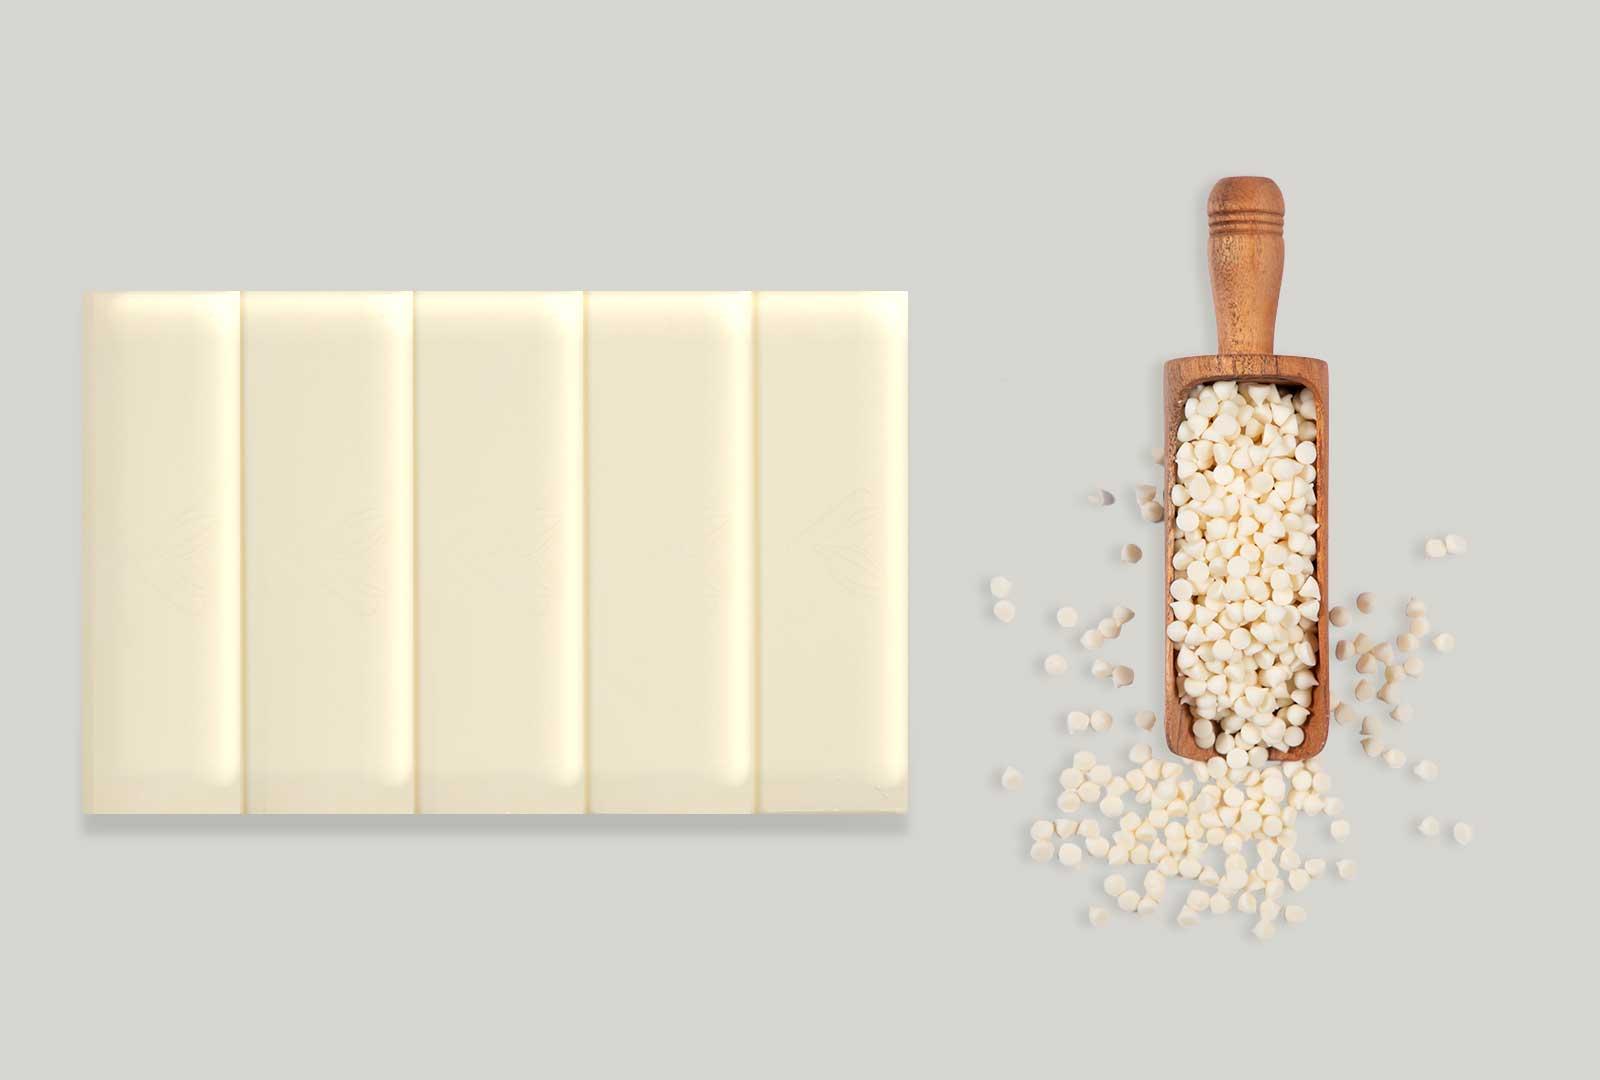 glossy-white-chocolate-compound-1